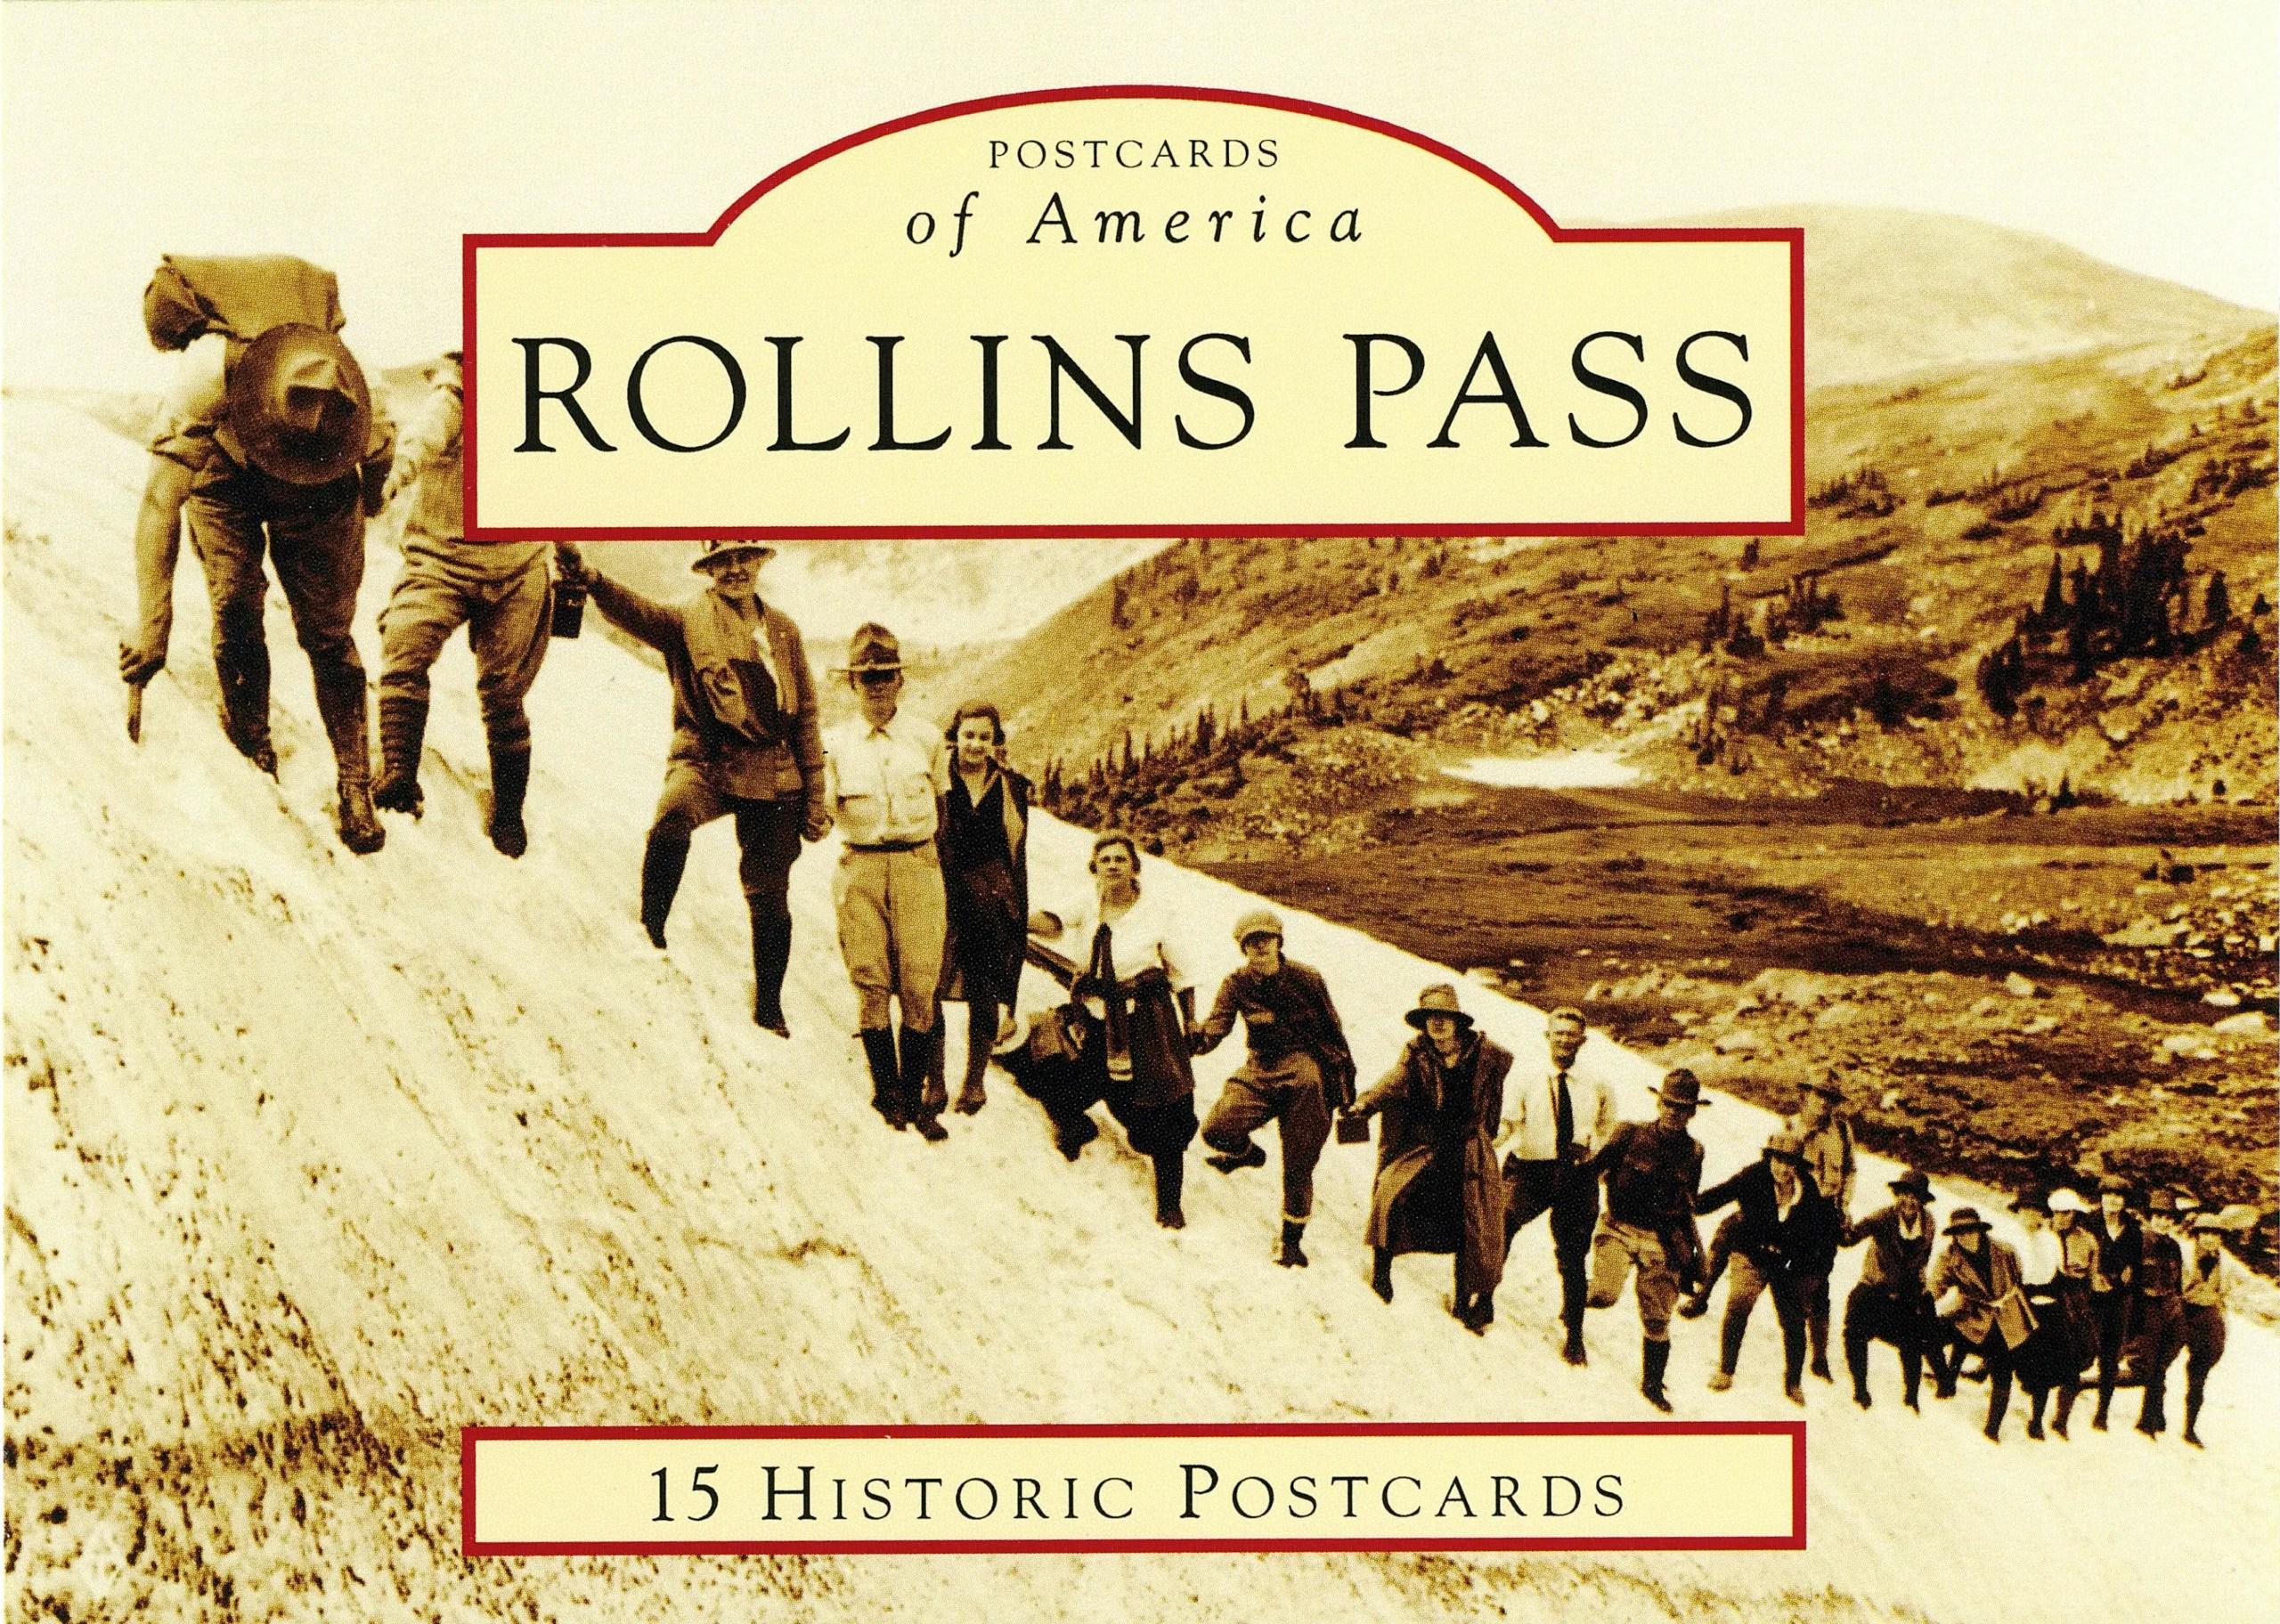 Rollins Pass Postcards